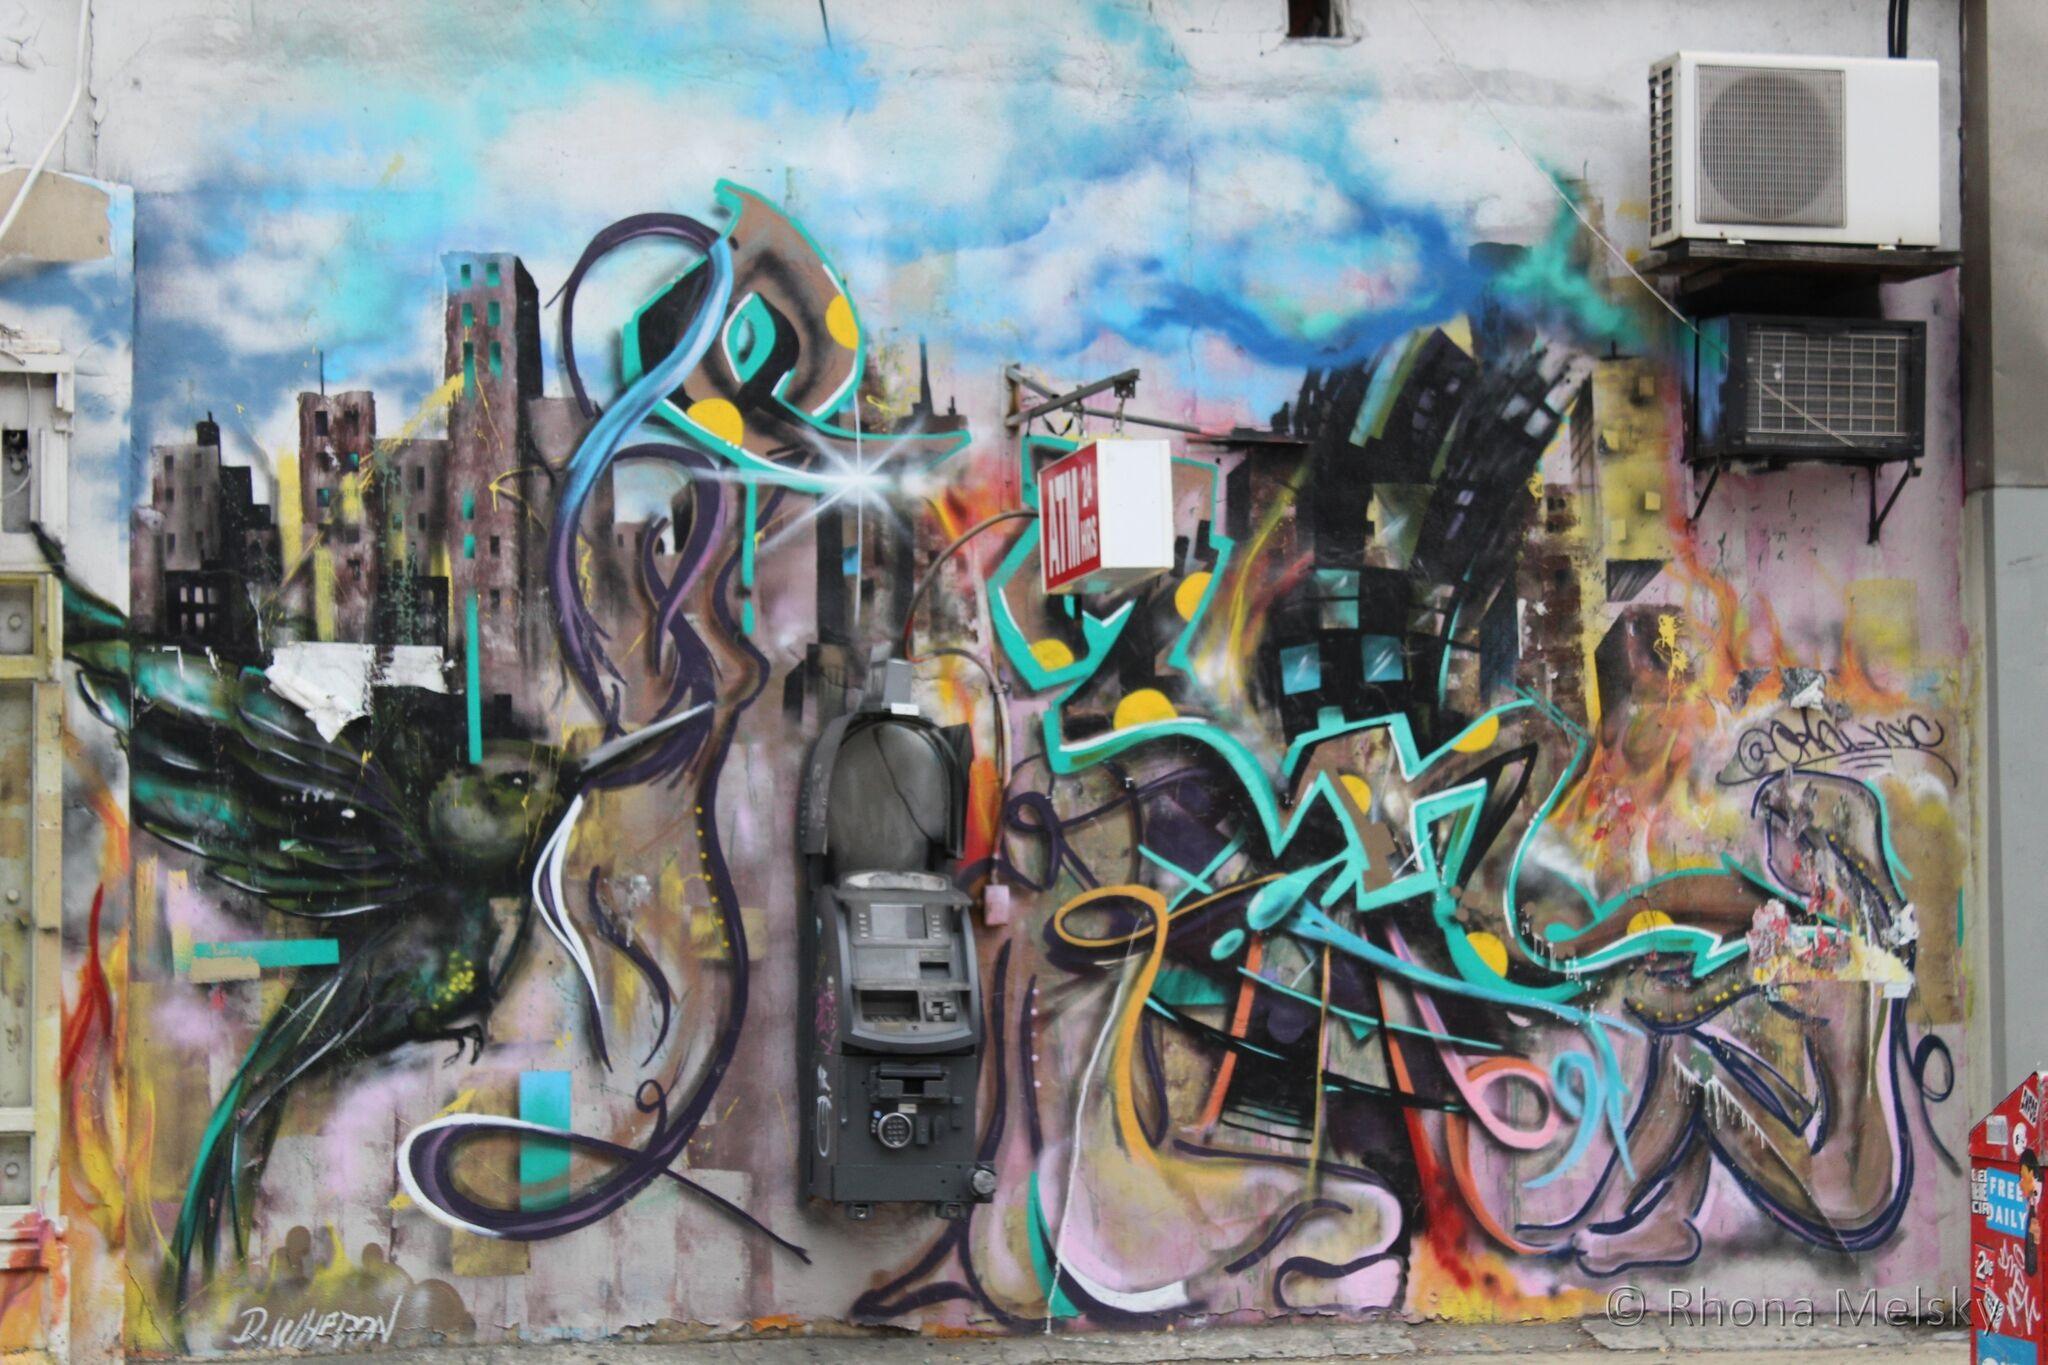 graffiti in soho.jpg